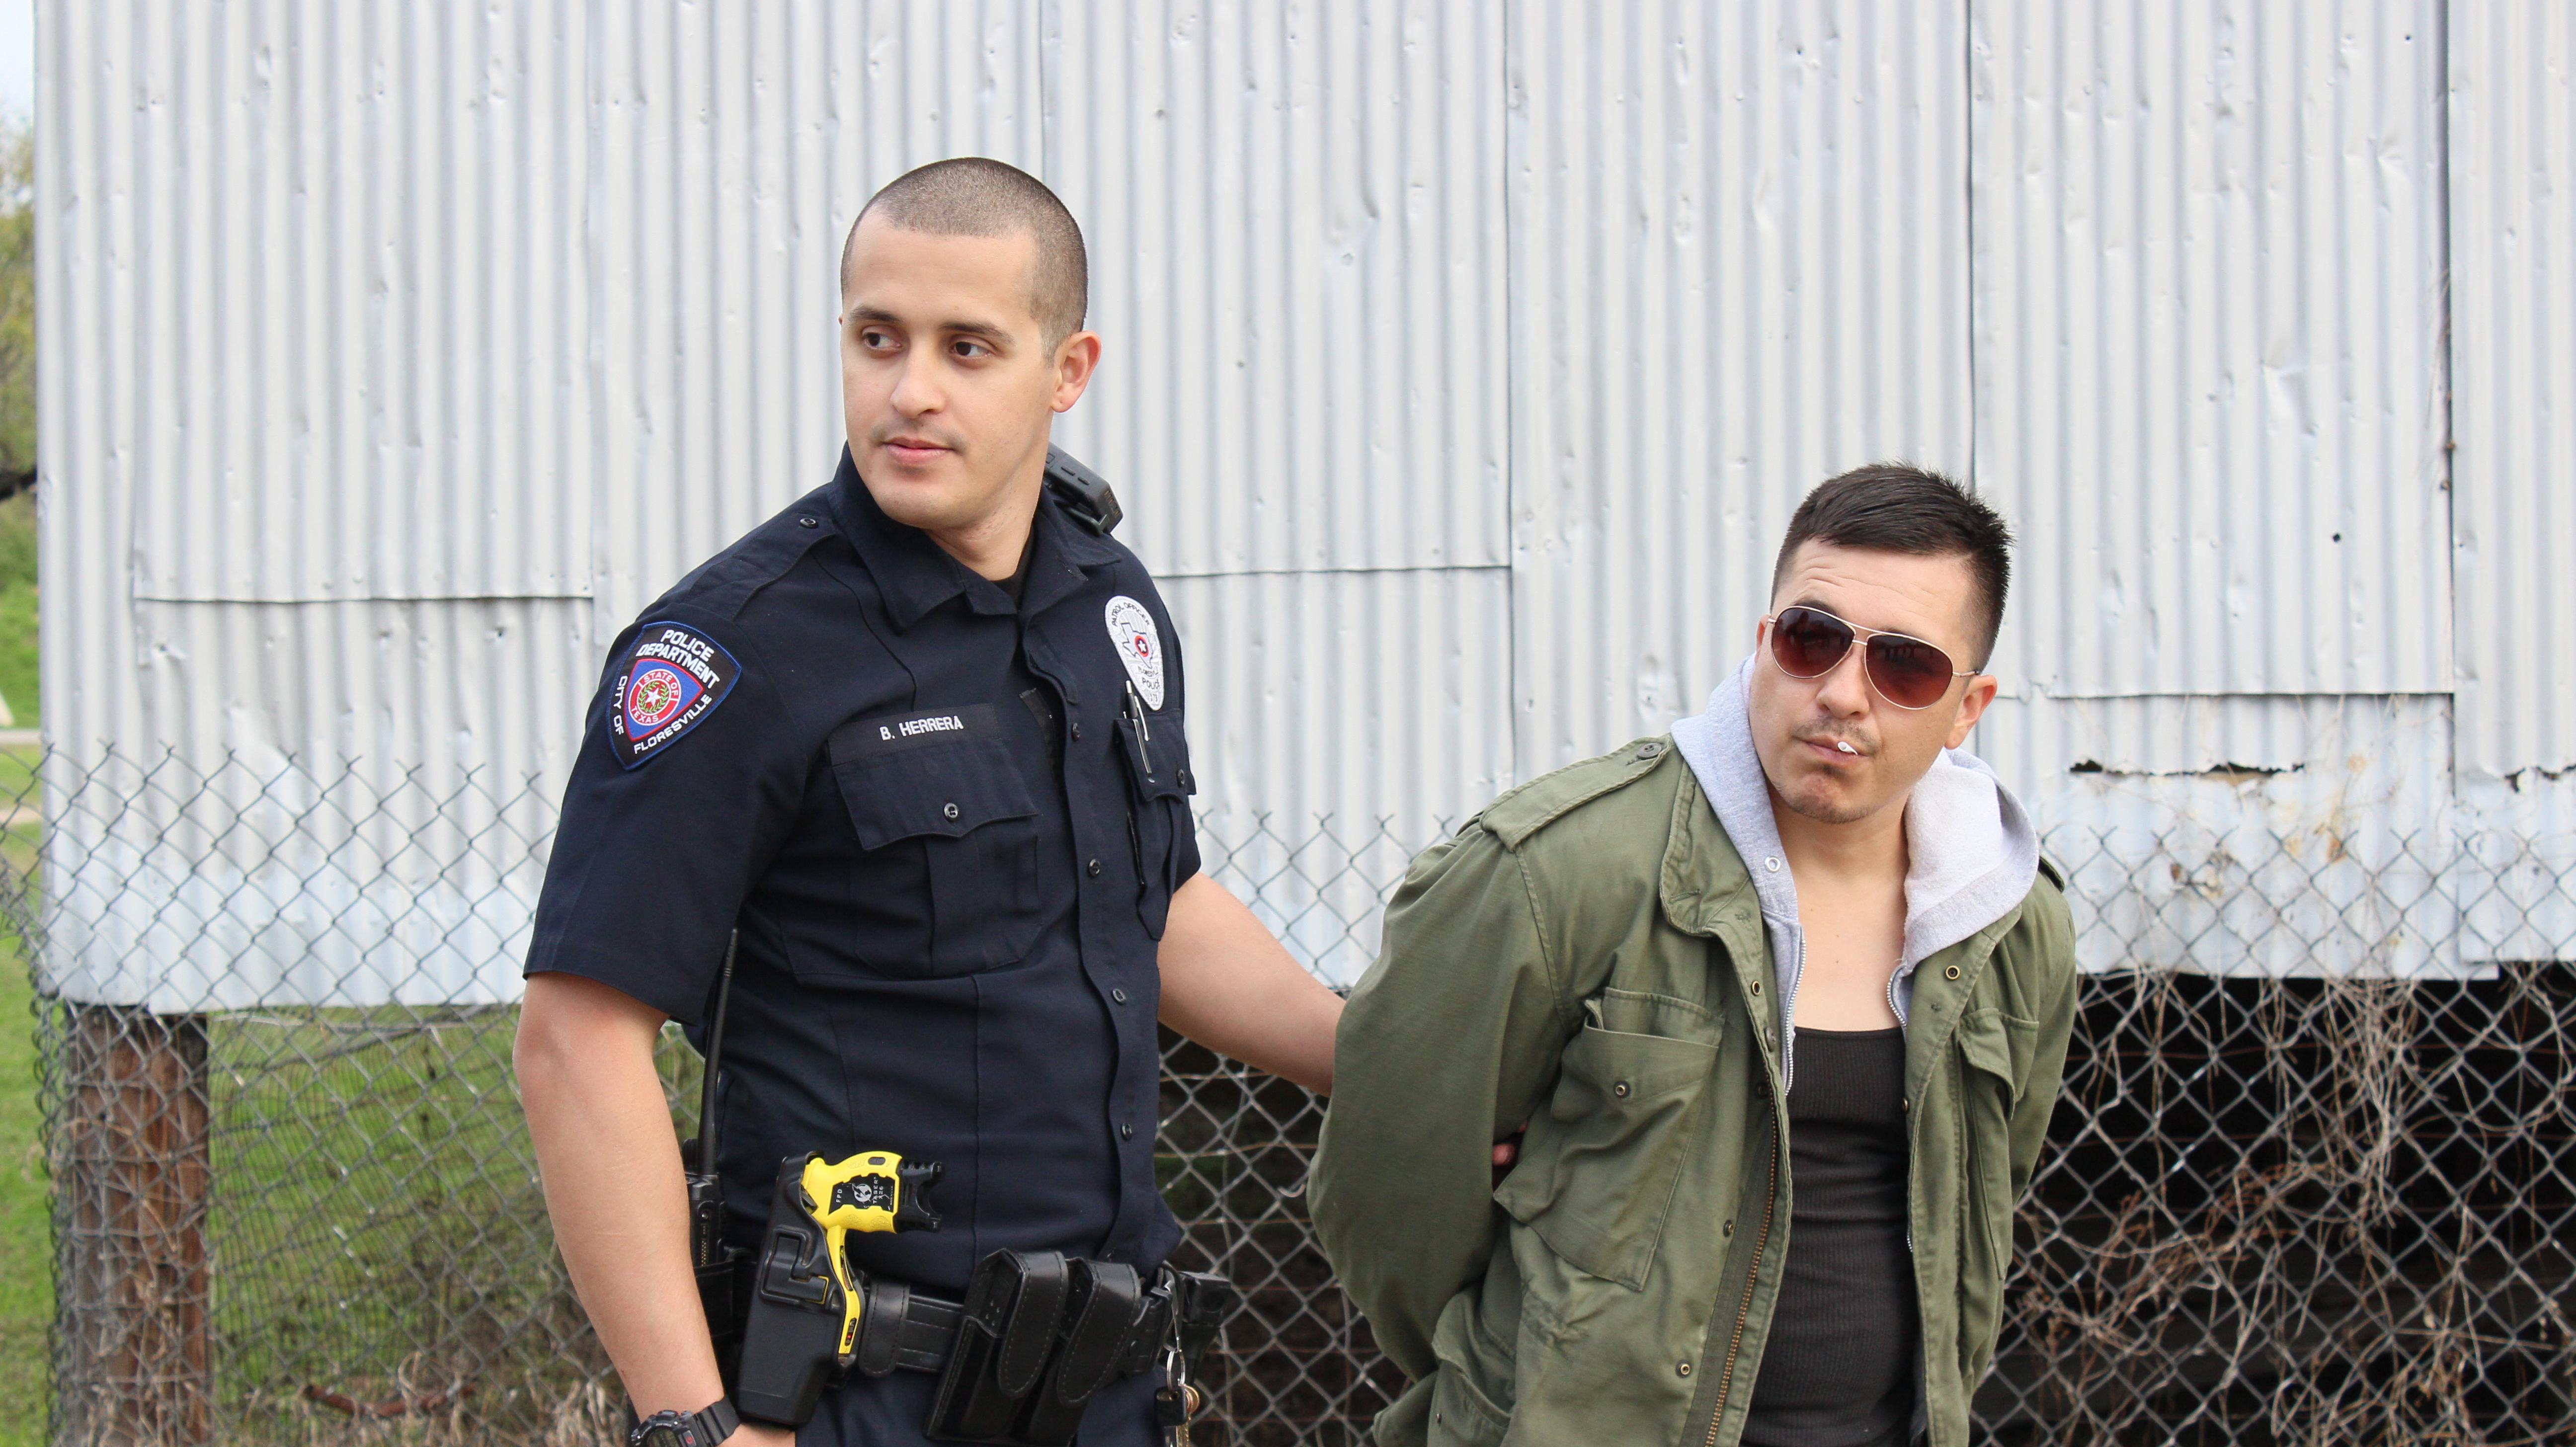 Officer Herrera with Edgar